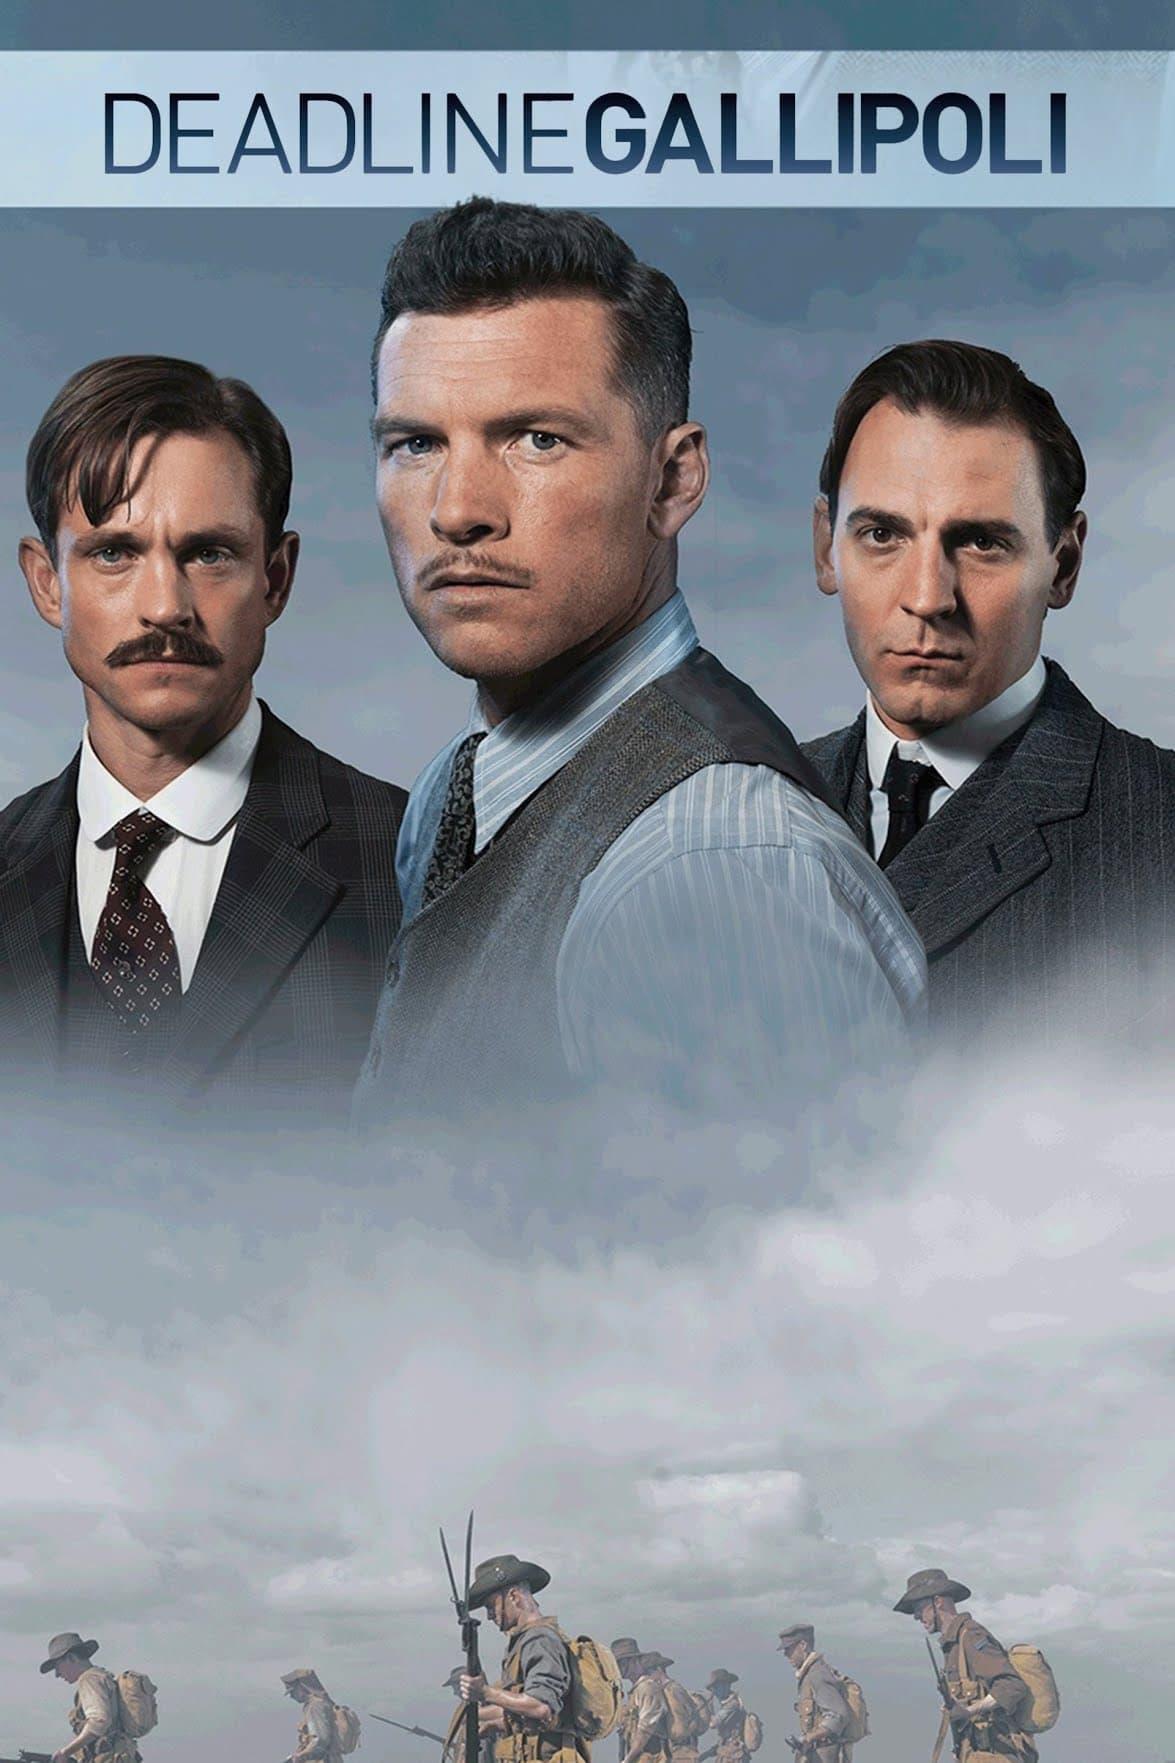 Deadline Gallipoli